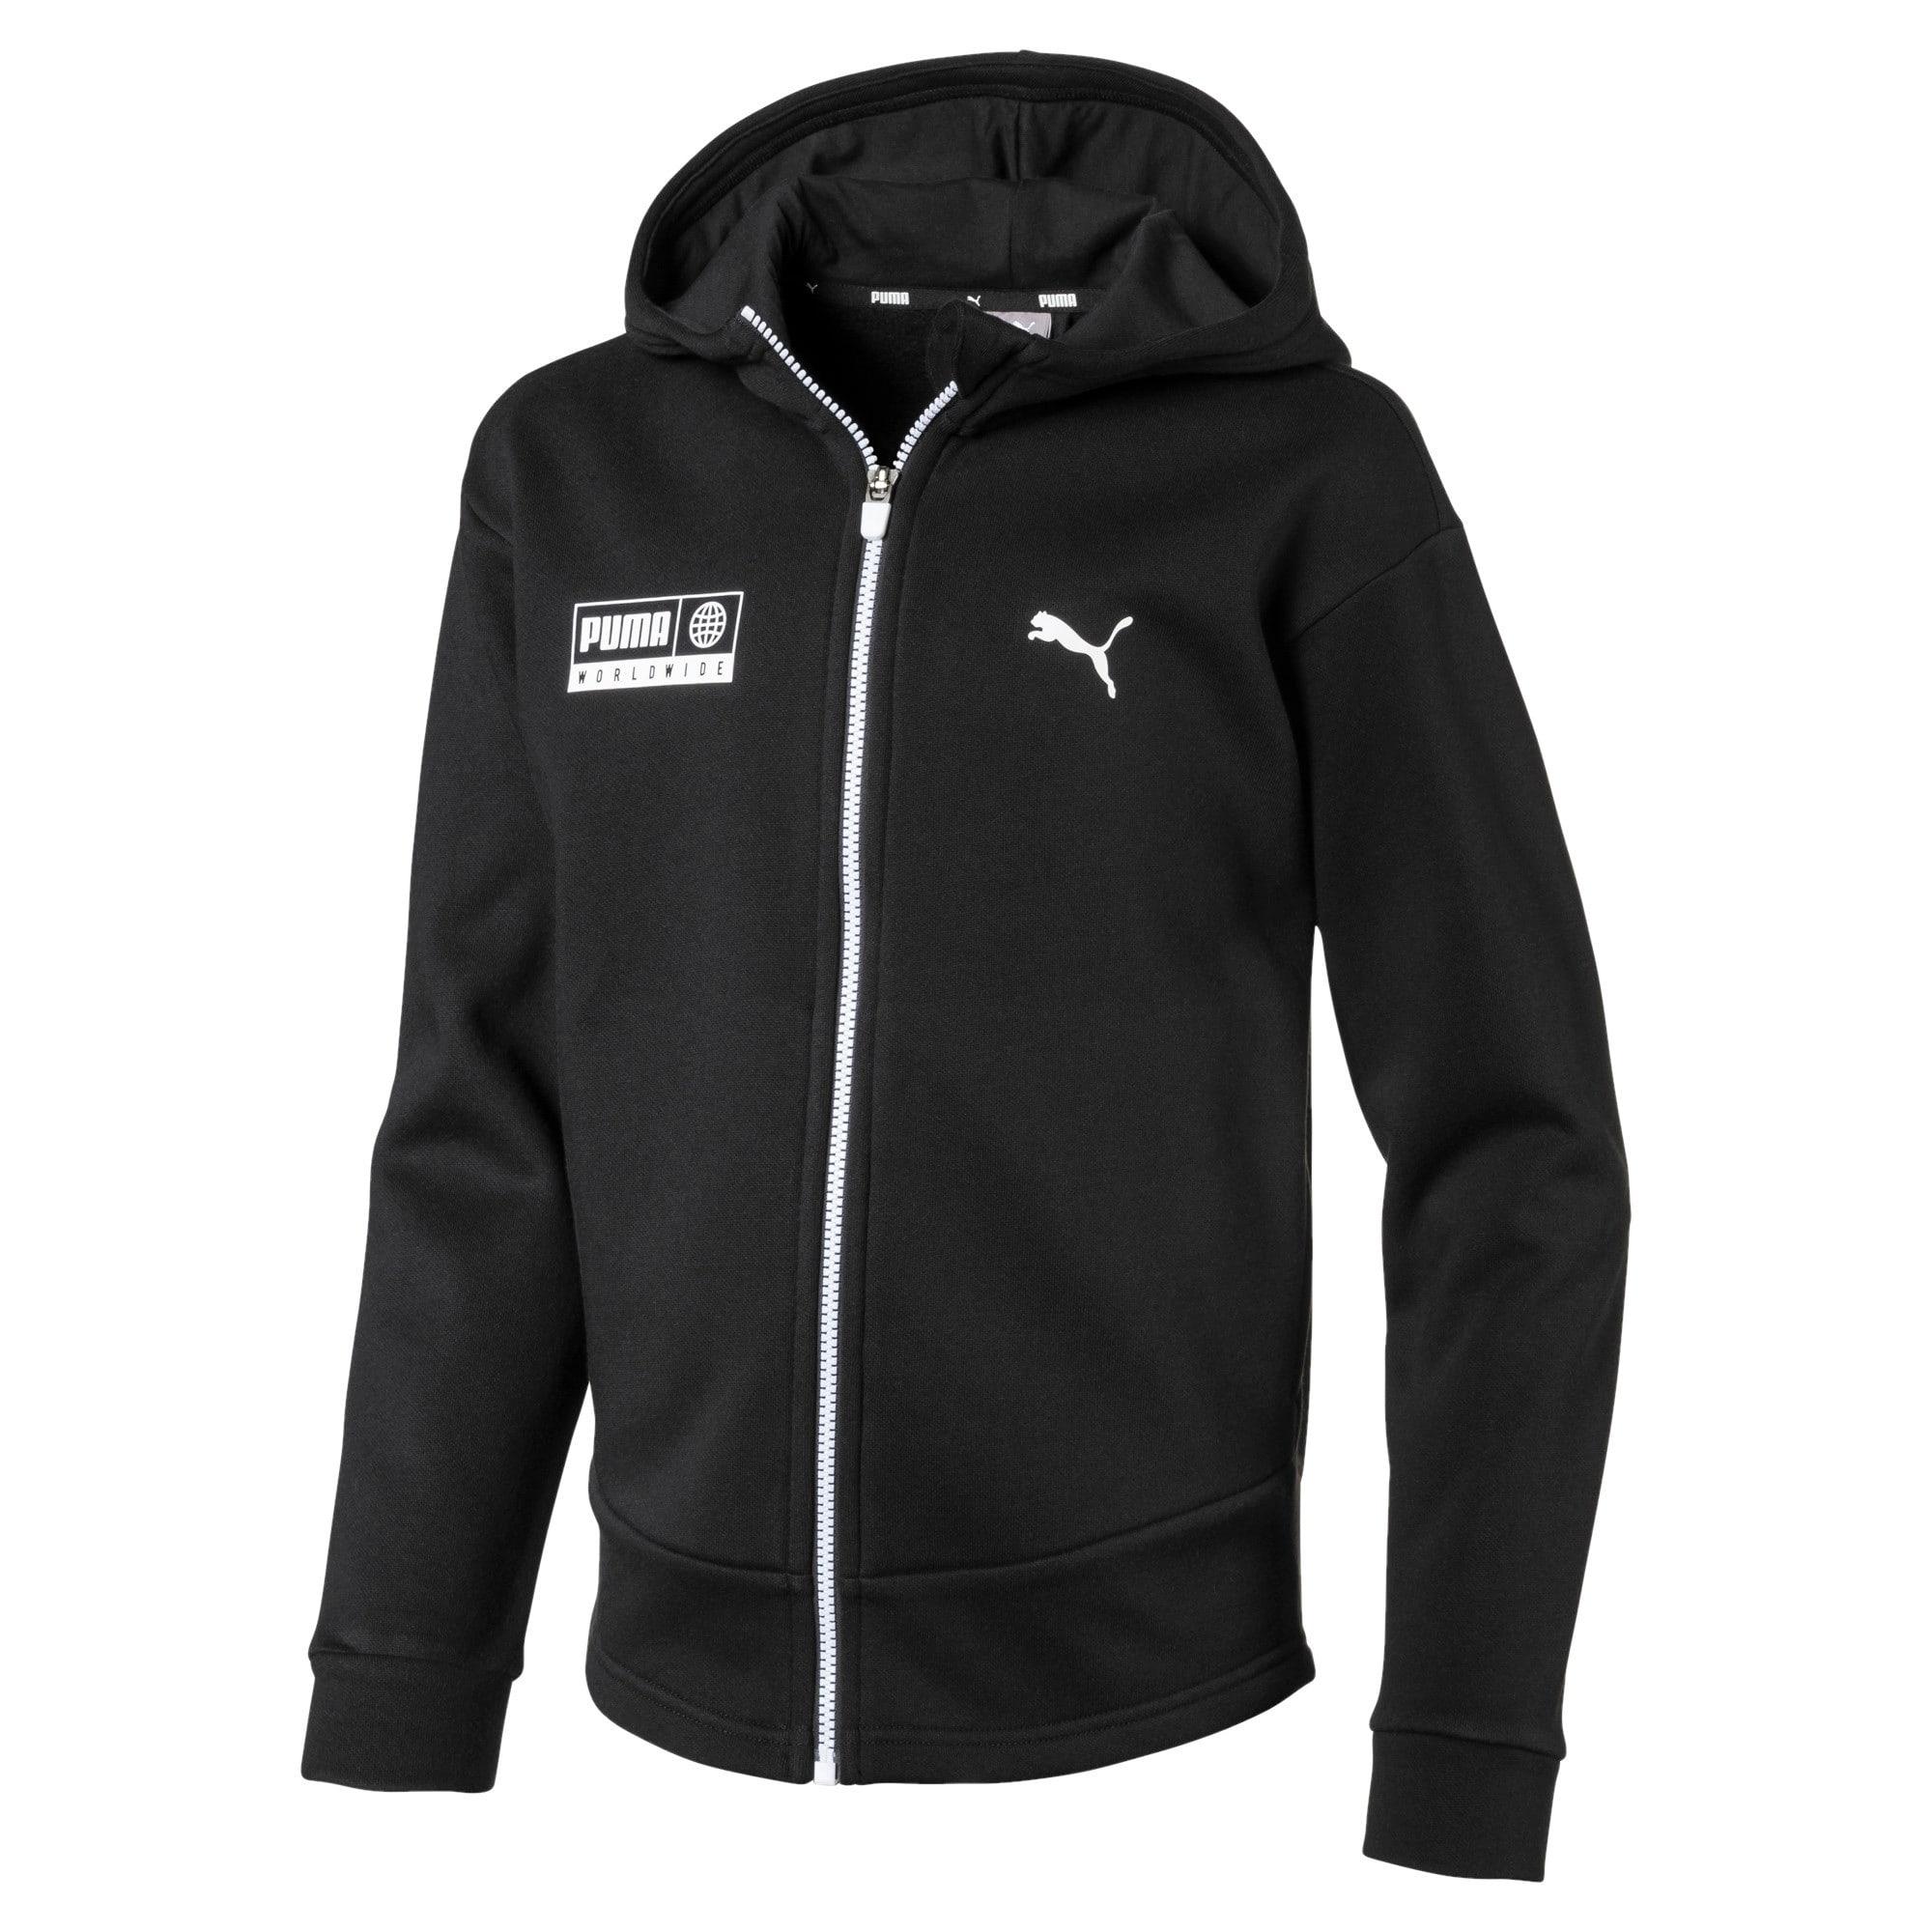 Thumbnail 1 of Men's Alpha Graphic Sweat Jacket, Puma Black, medium-IND